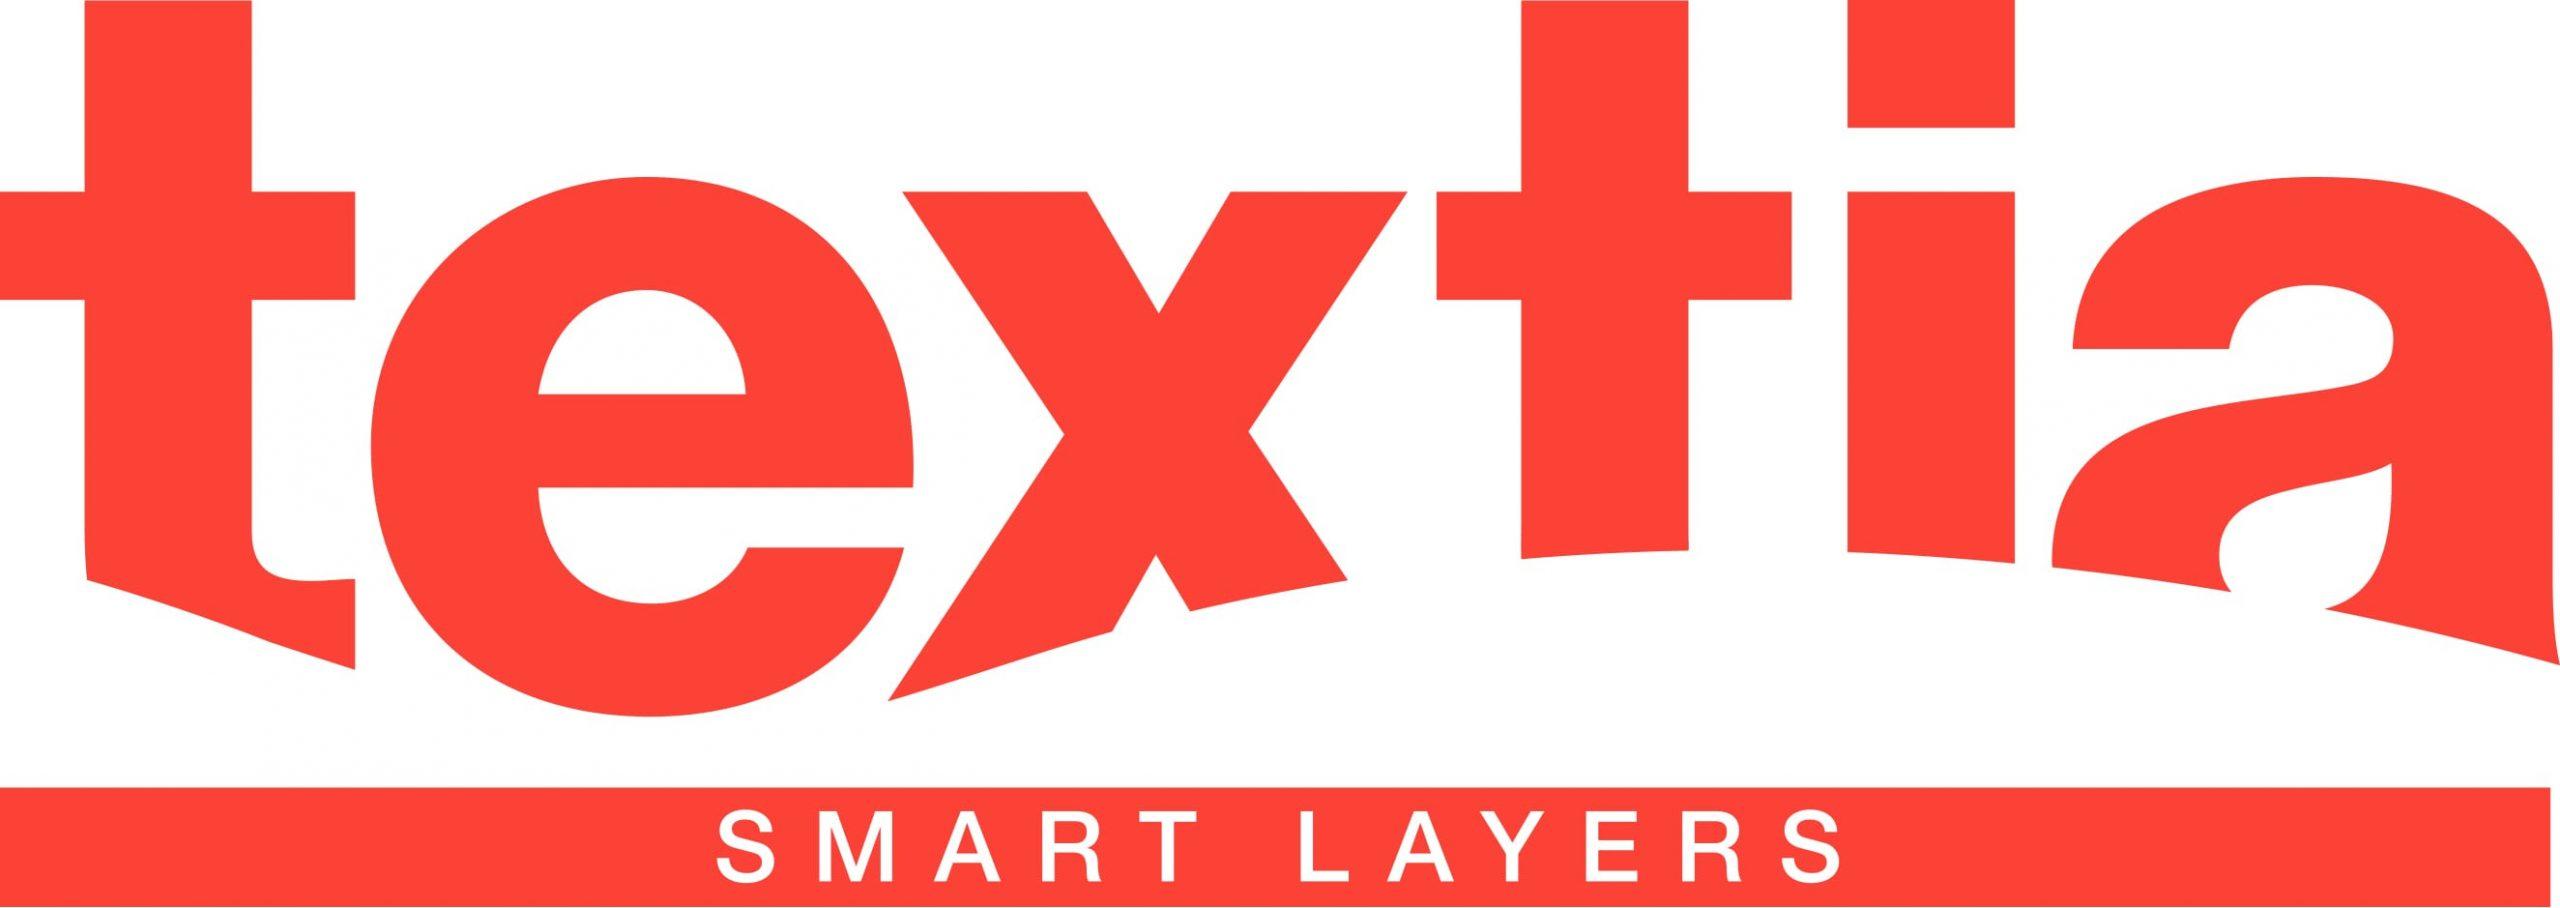 Textia logo